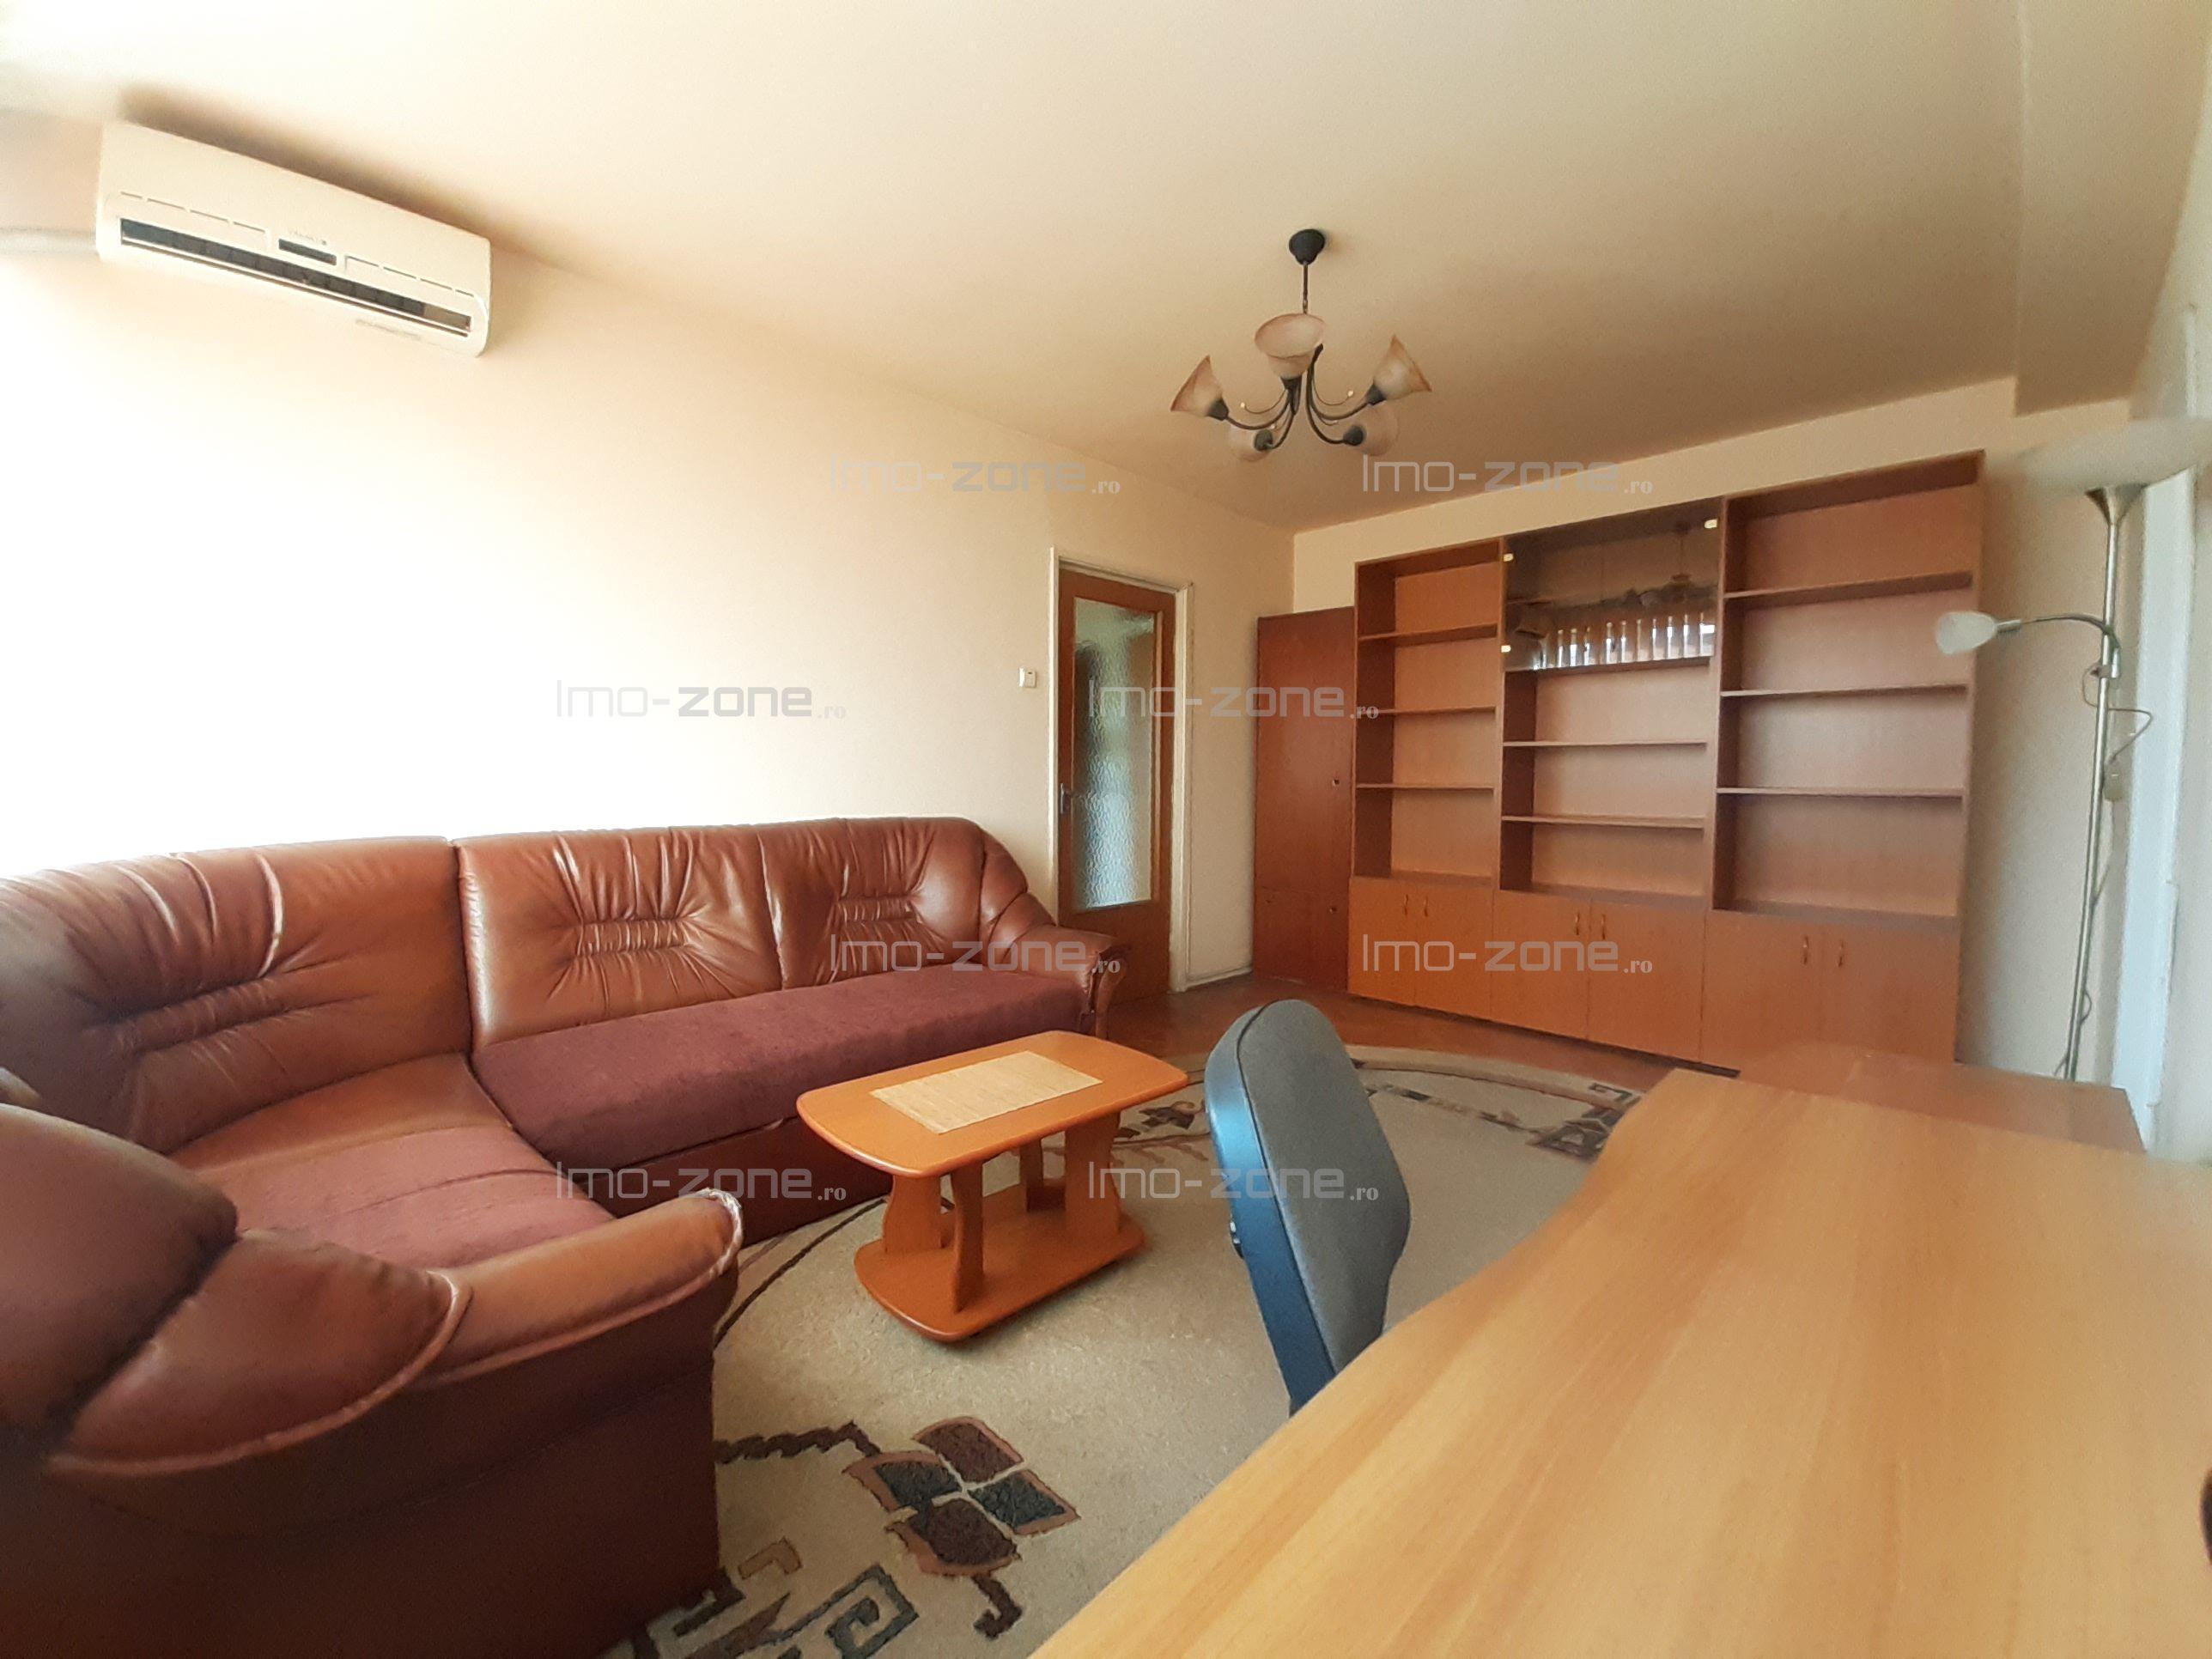 Inchiriere apartament 3 camere Metrou Piata Iancului, mobilat, utilat, 375 Euro